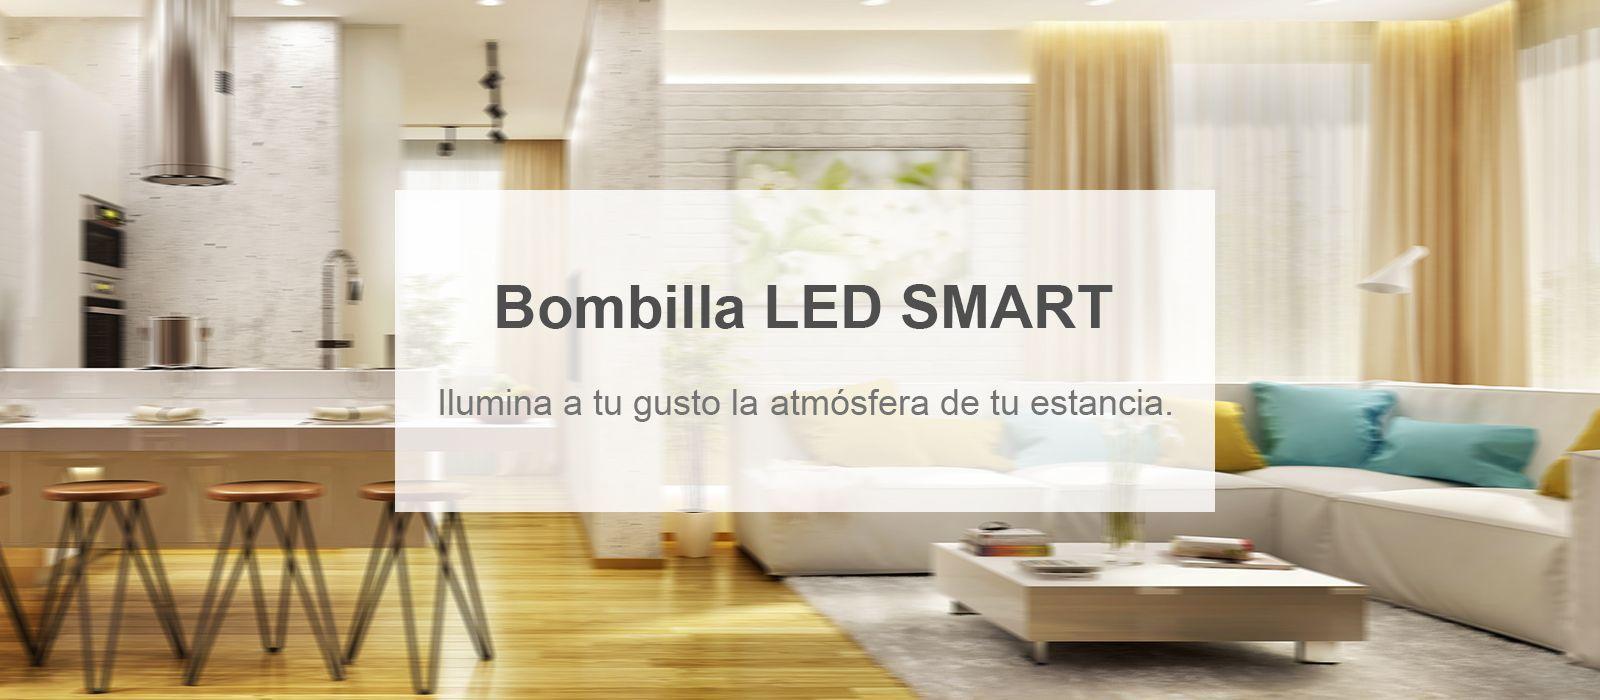 Bombillas LED Smart